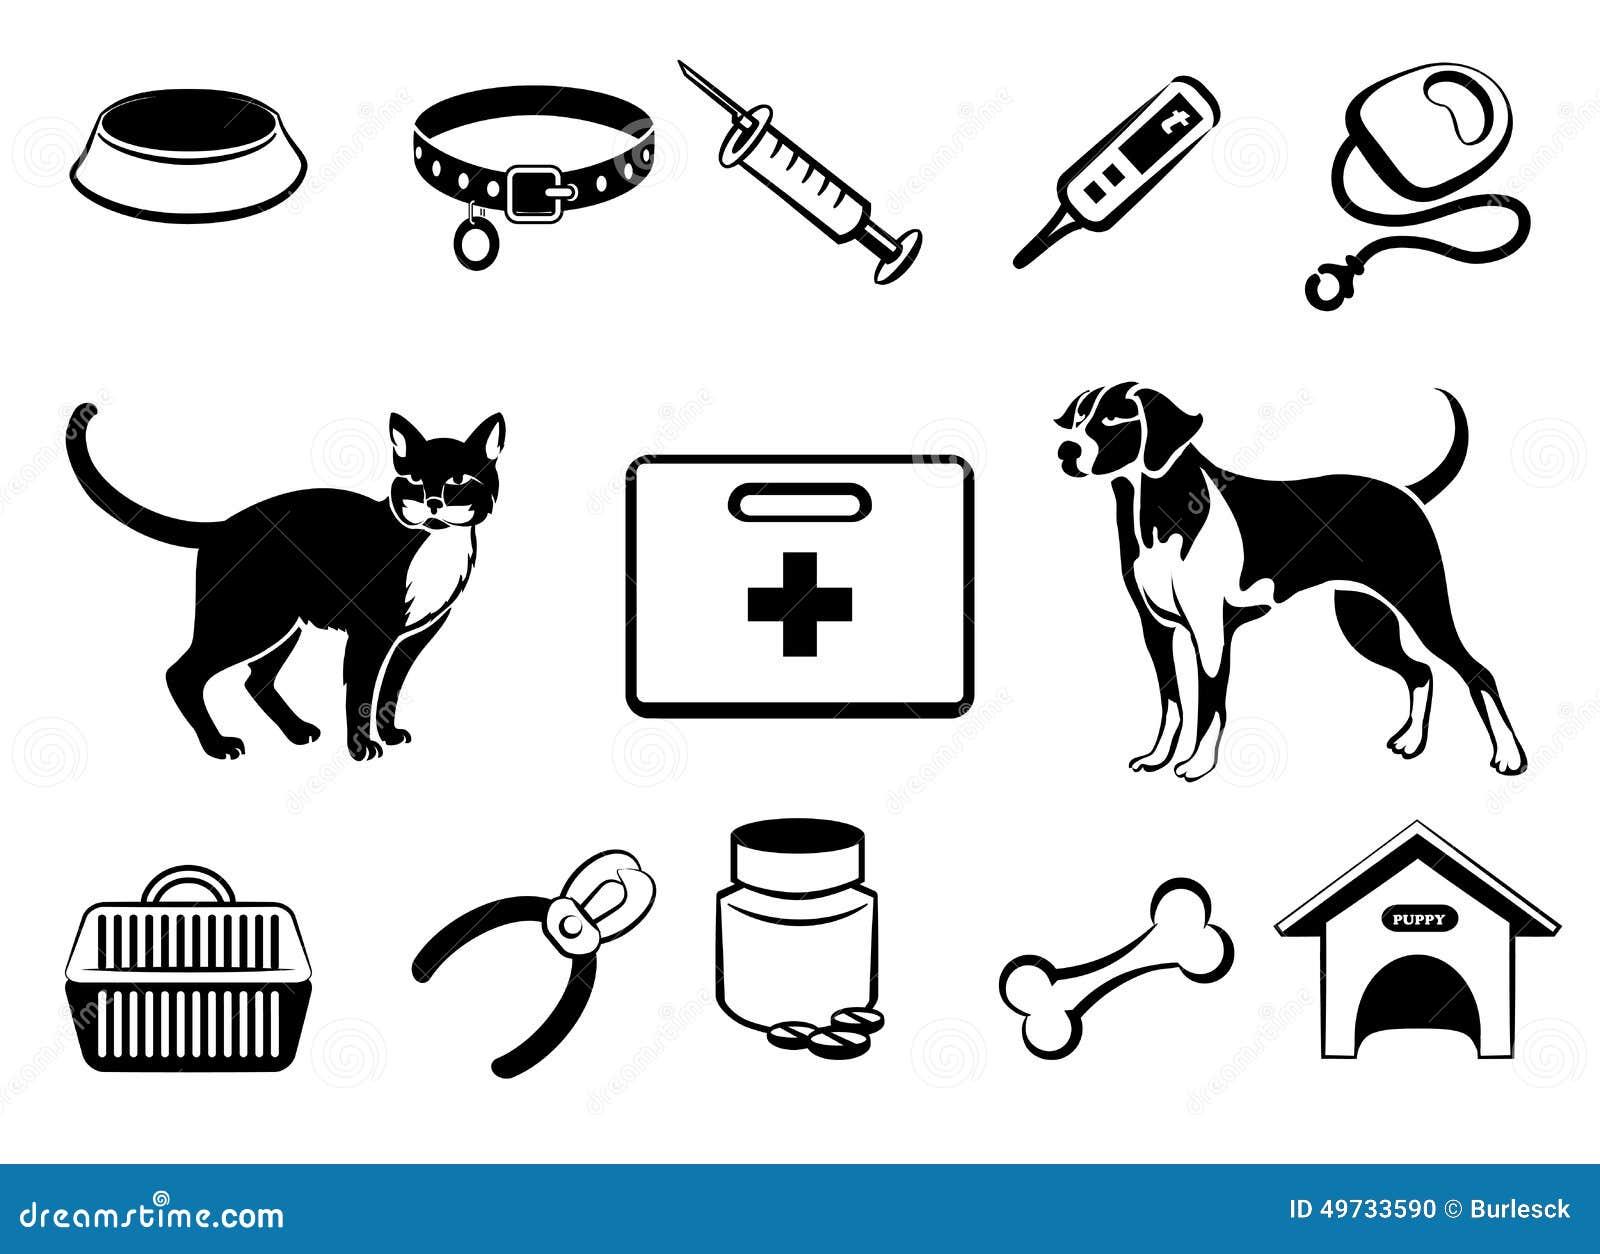 Pets Veterinary Medicine Icons Stock Vector - Image: 49733590